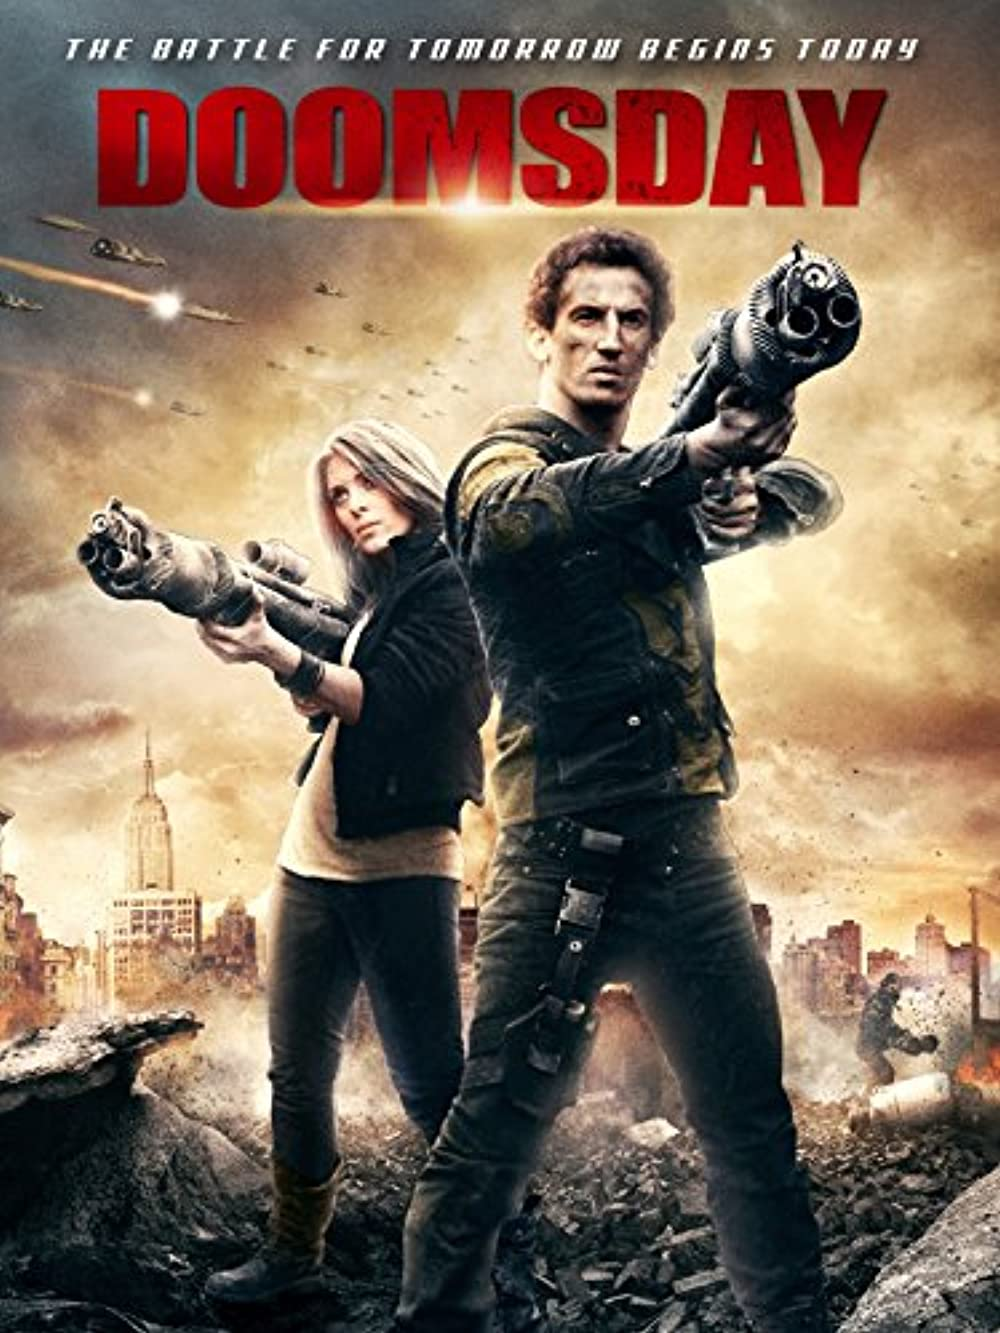 Doomsday 2015 Hindi ORG Dual Audio 480p HDRip 350MB x264 AAC